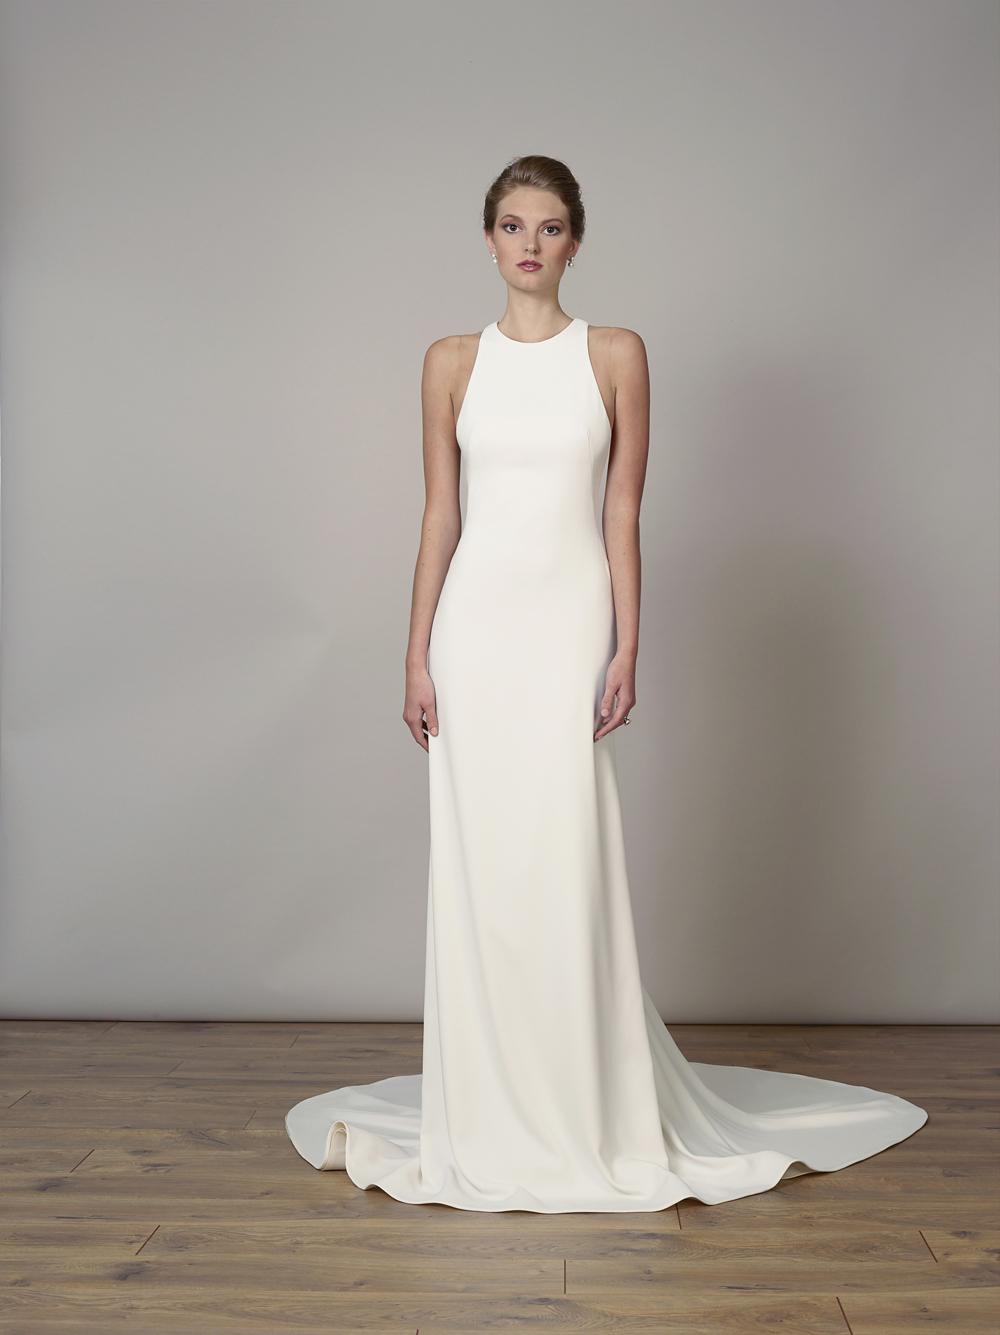 Liancarlo minimalist wedding dress high neck meghan markle dress inspiration